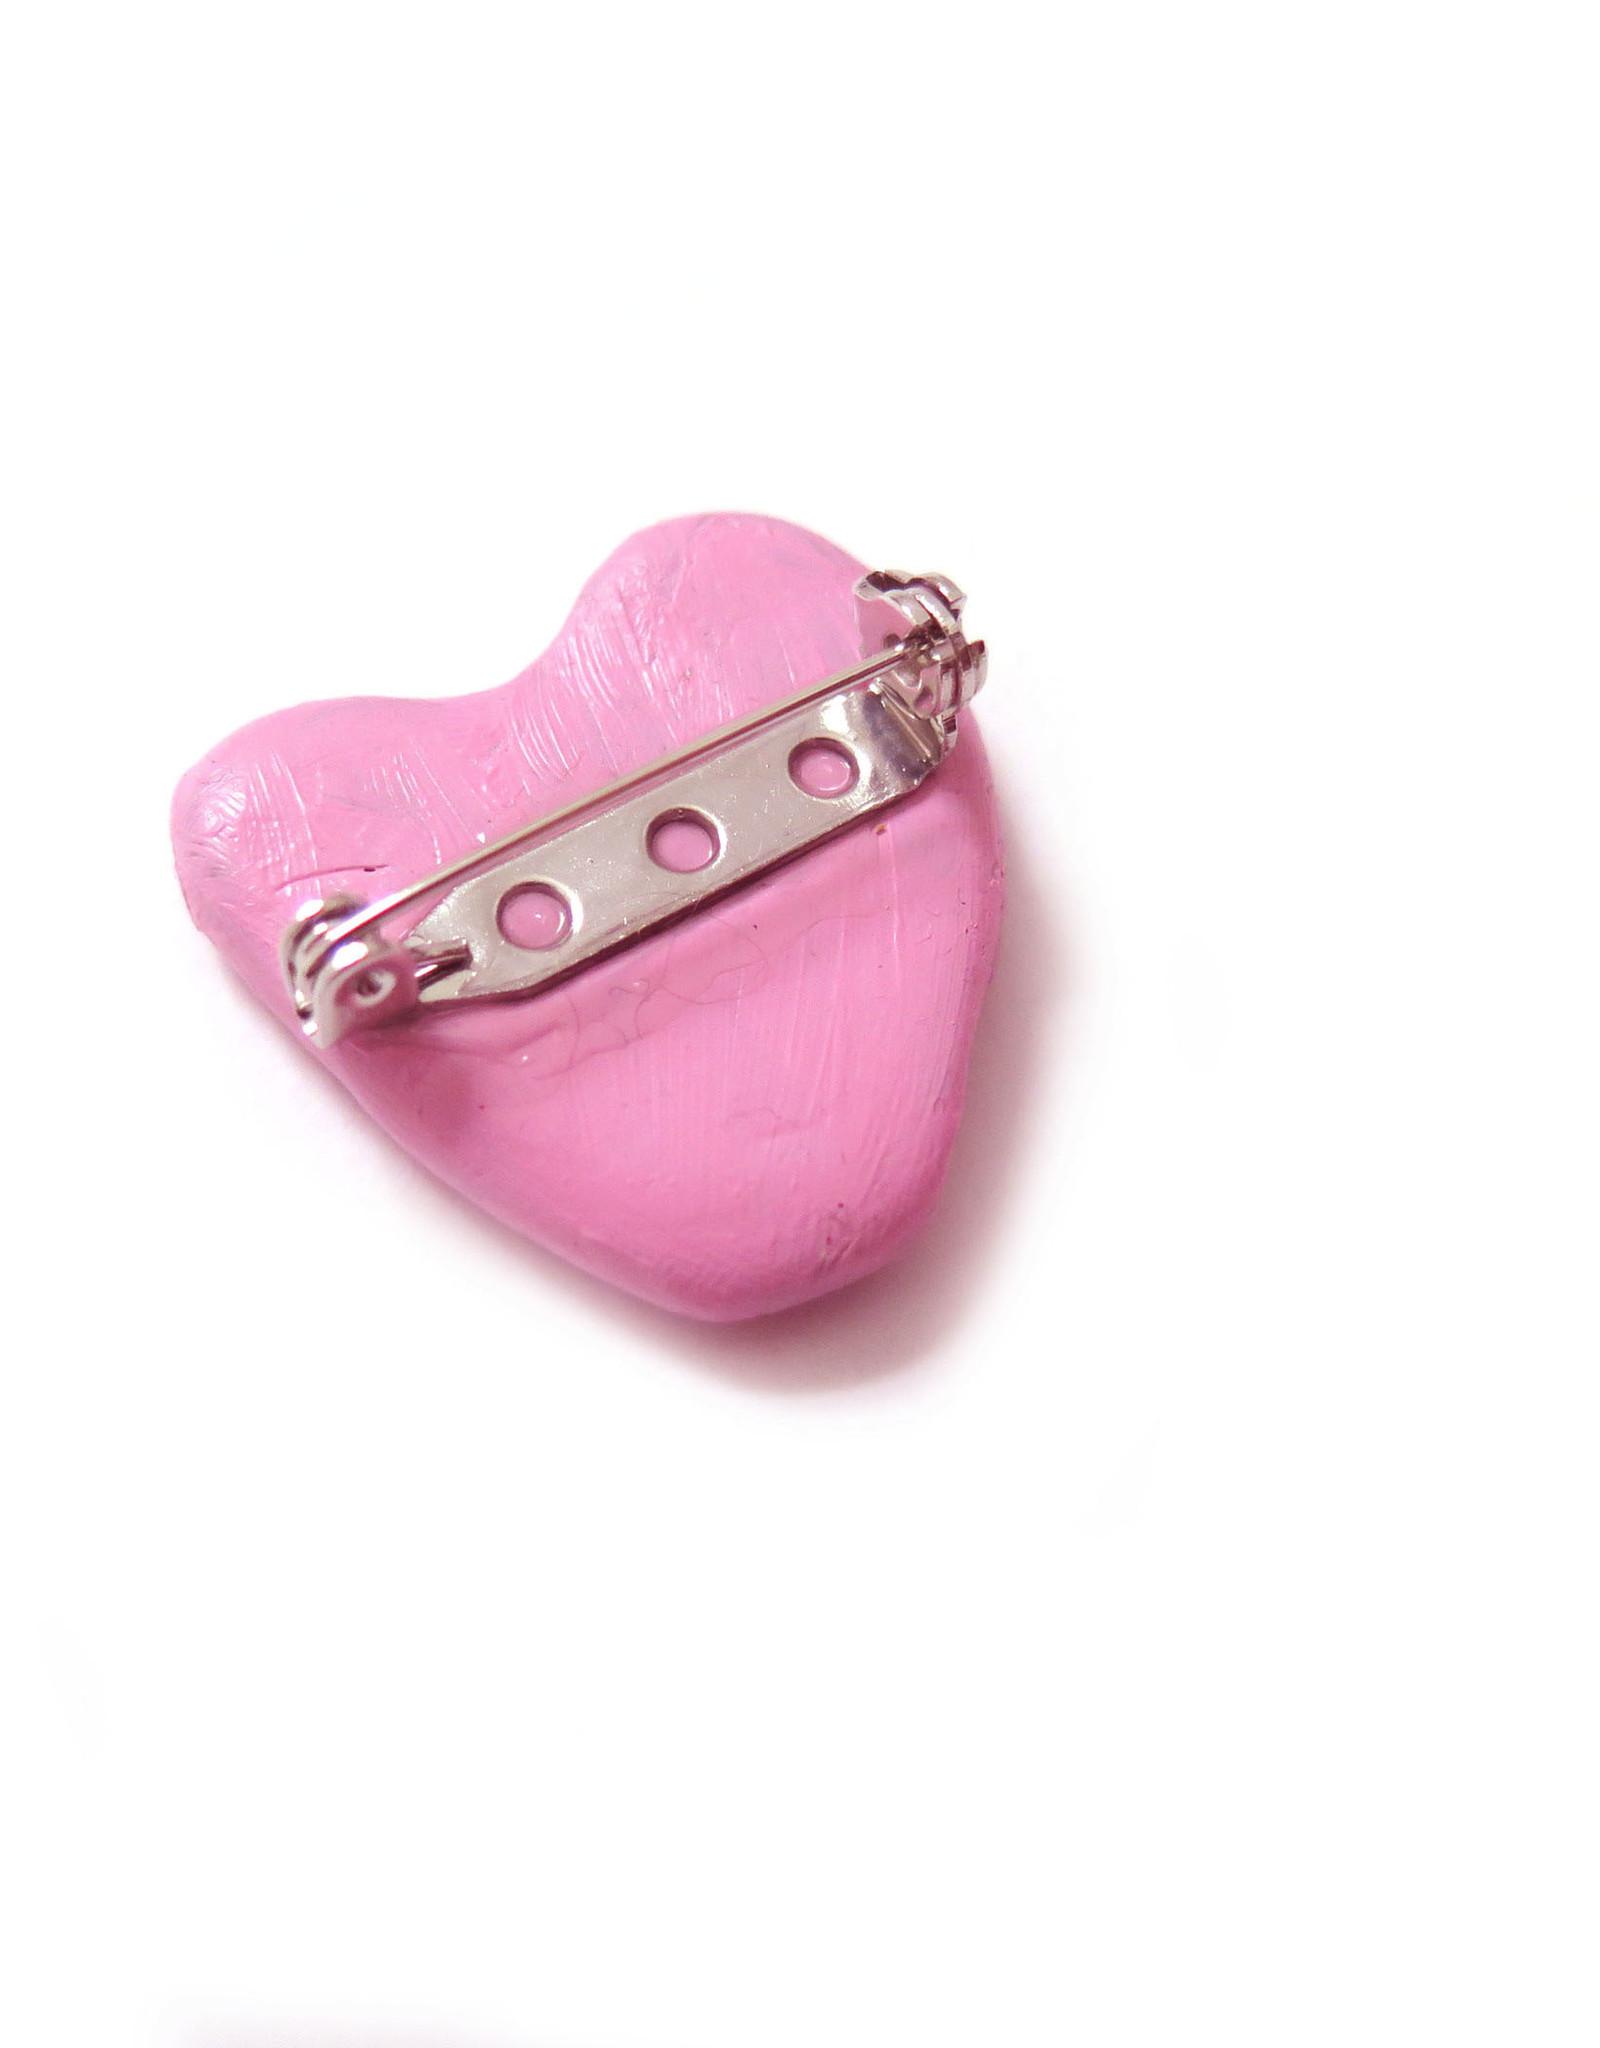 Eve Senderhauf Small Heart Clay Pin by Eve Senderhauf